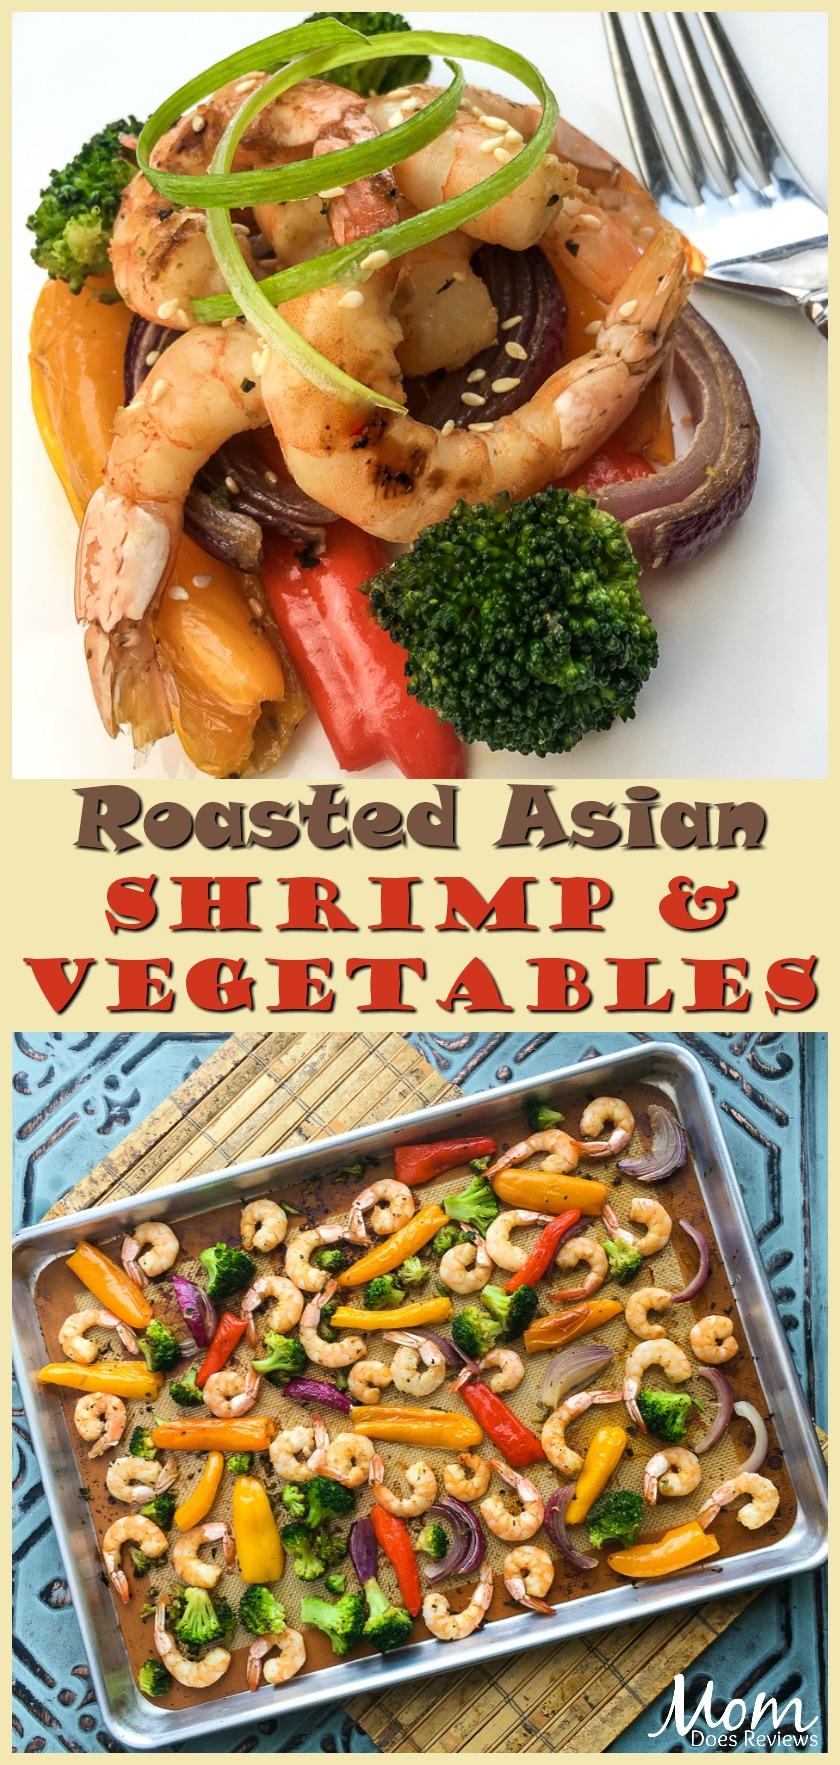 Roasted Asian Shrimp & Vegetables- Sheet Pan #Recipe #food #easyrecipes #sheetpan #shrimp #seafood #foodie